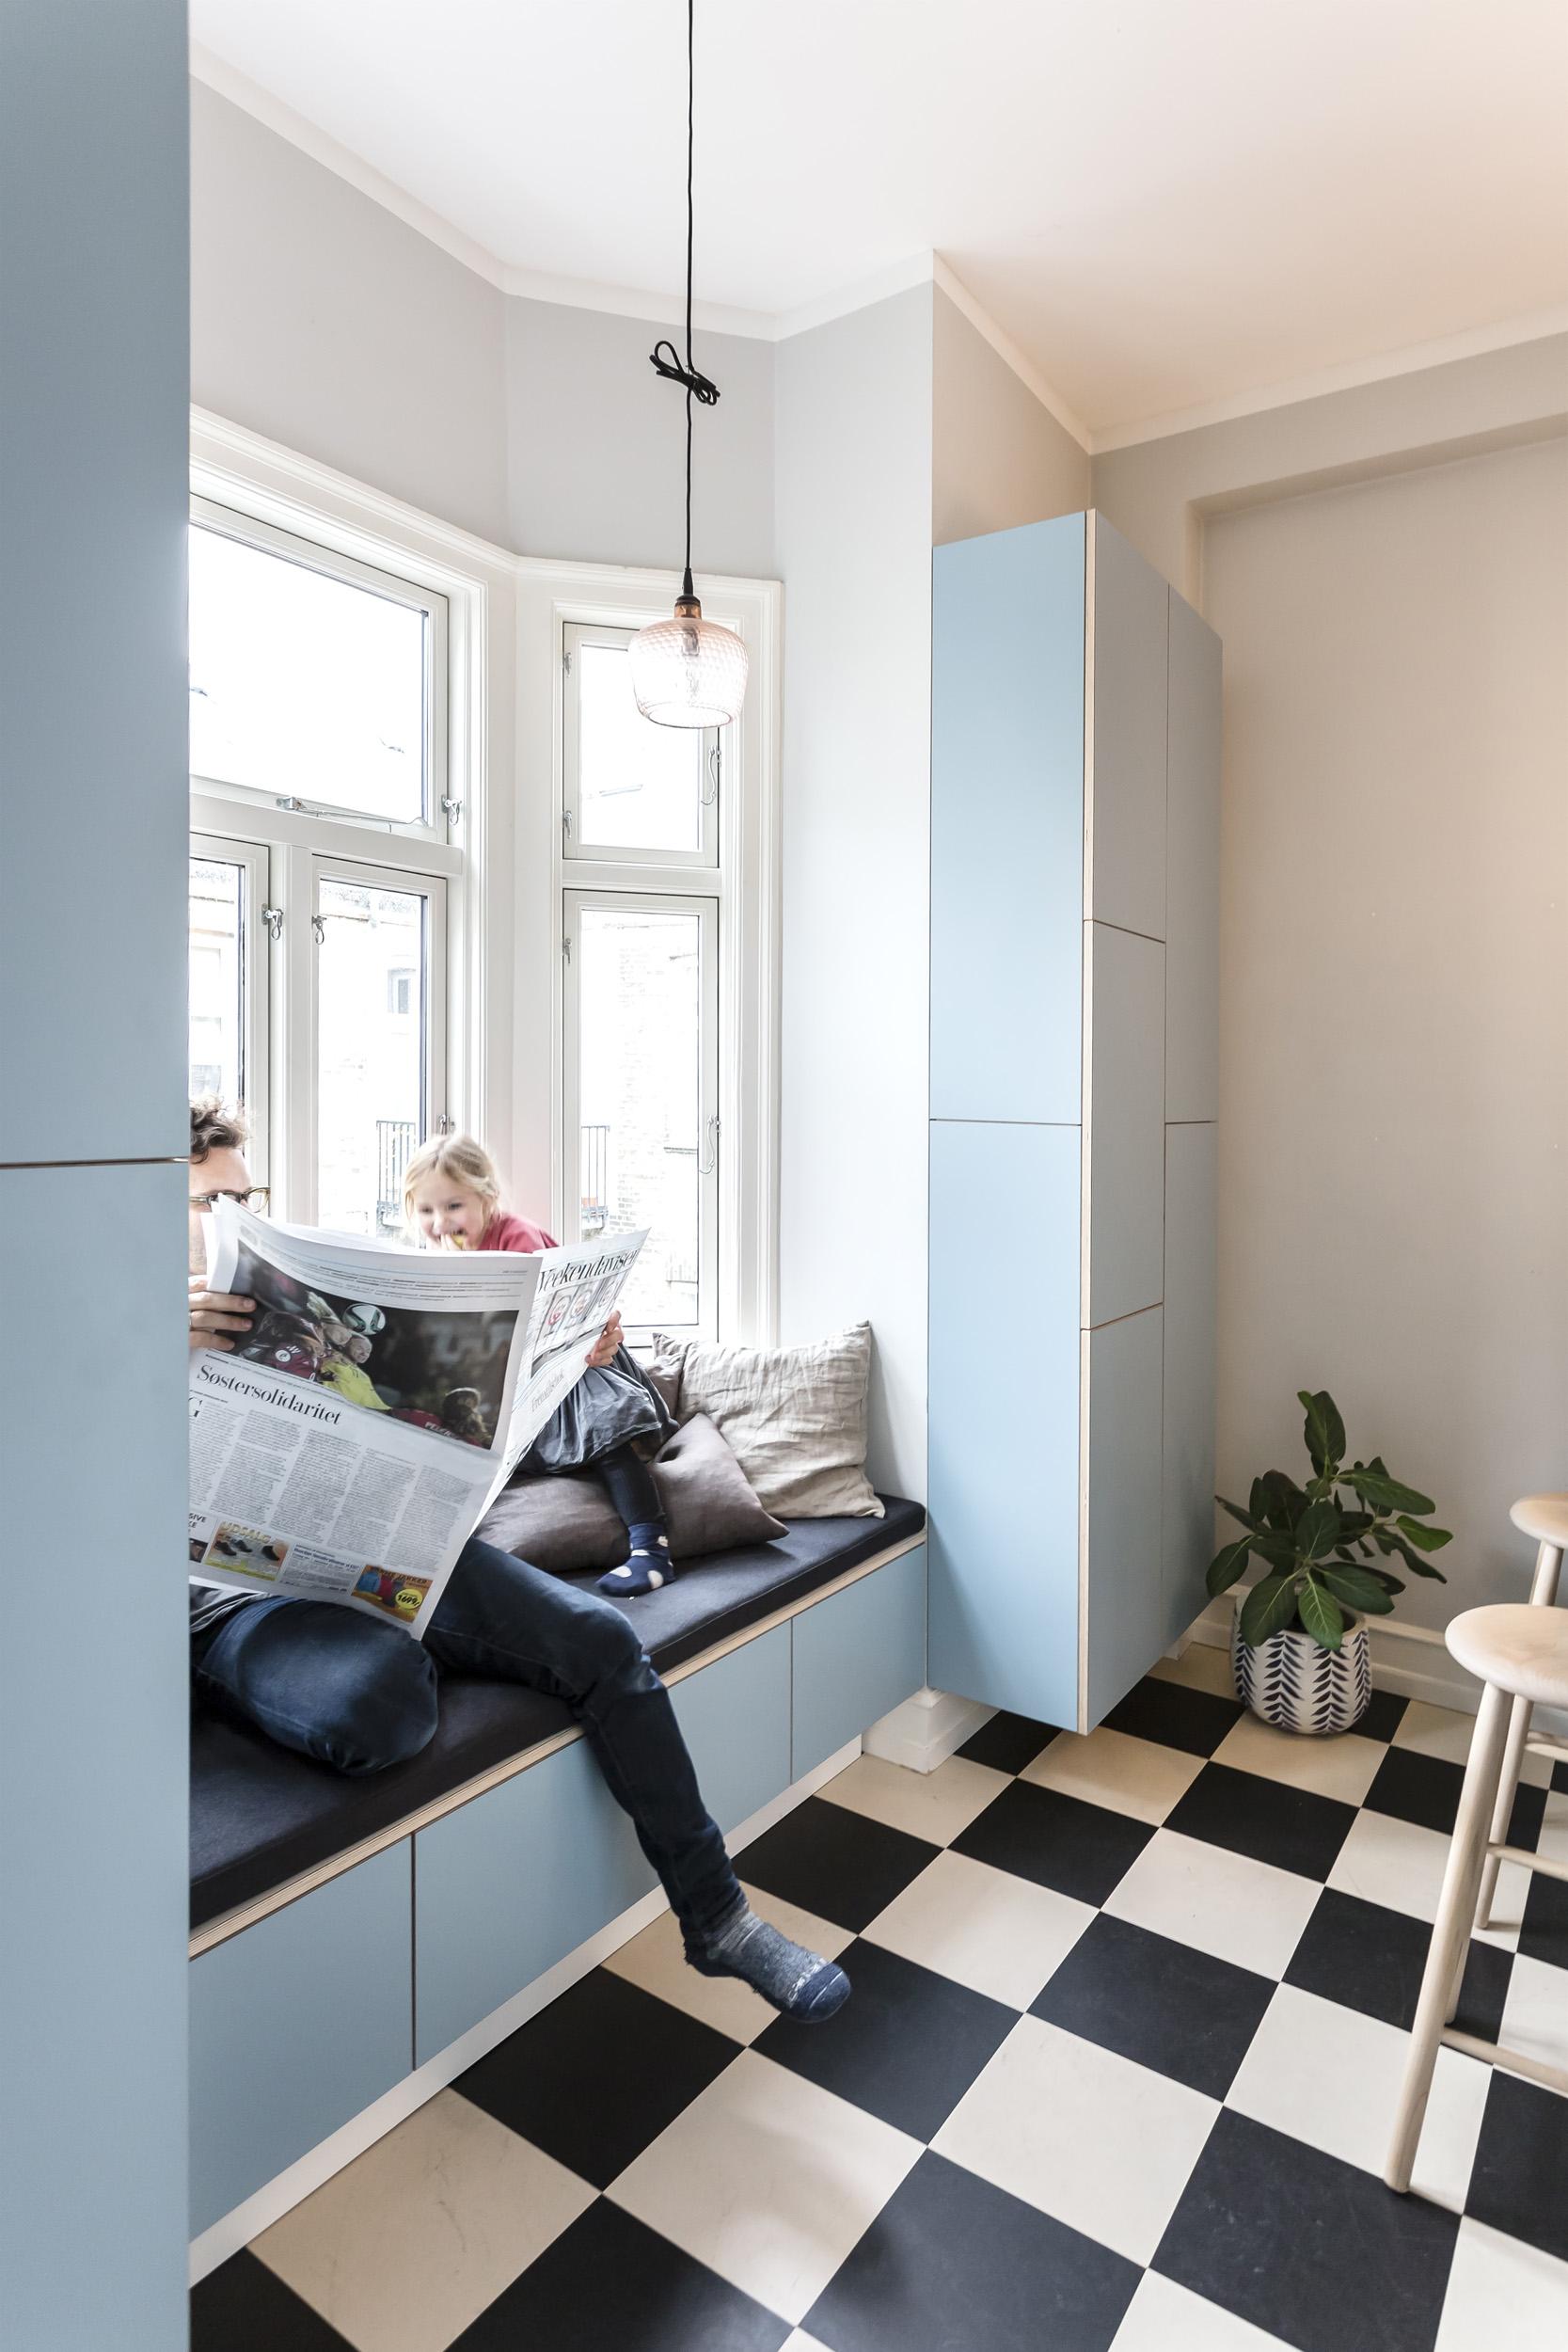 0376-a1v1-kitchen-storage-bench-seating-bay window-blue-minimal-stay-project-2500x.jpg